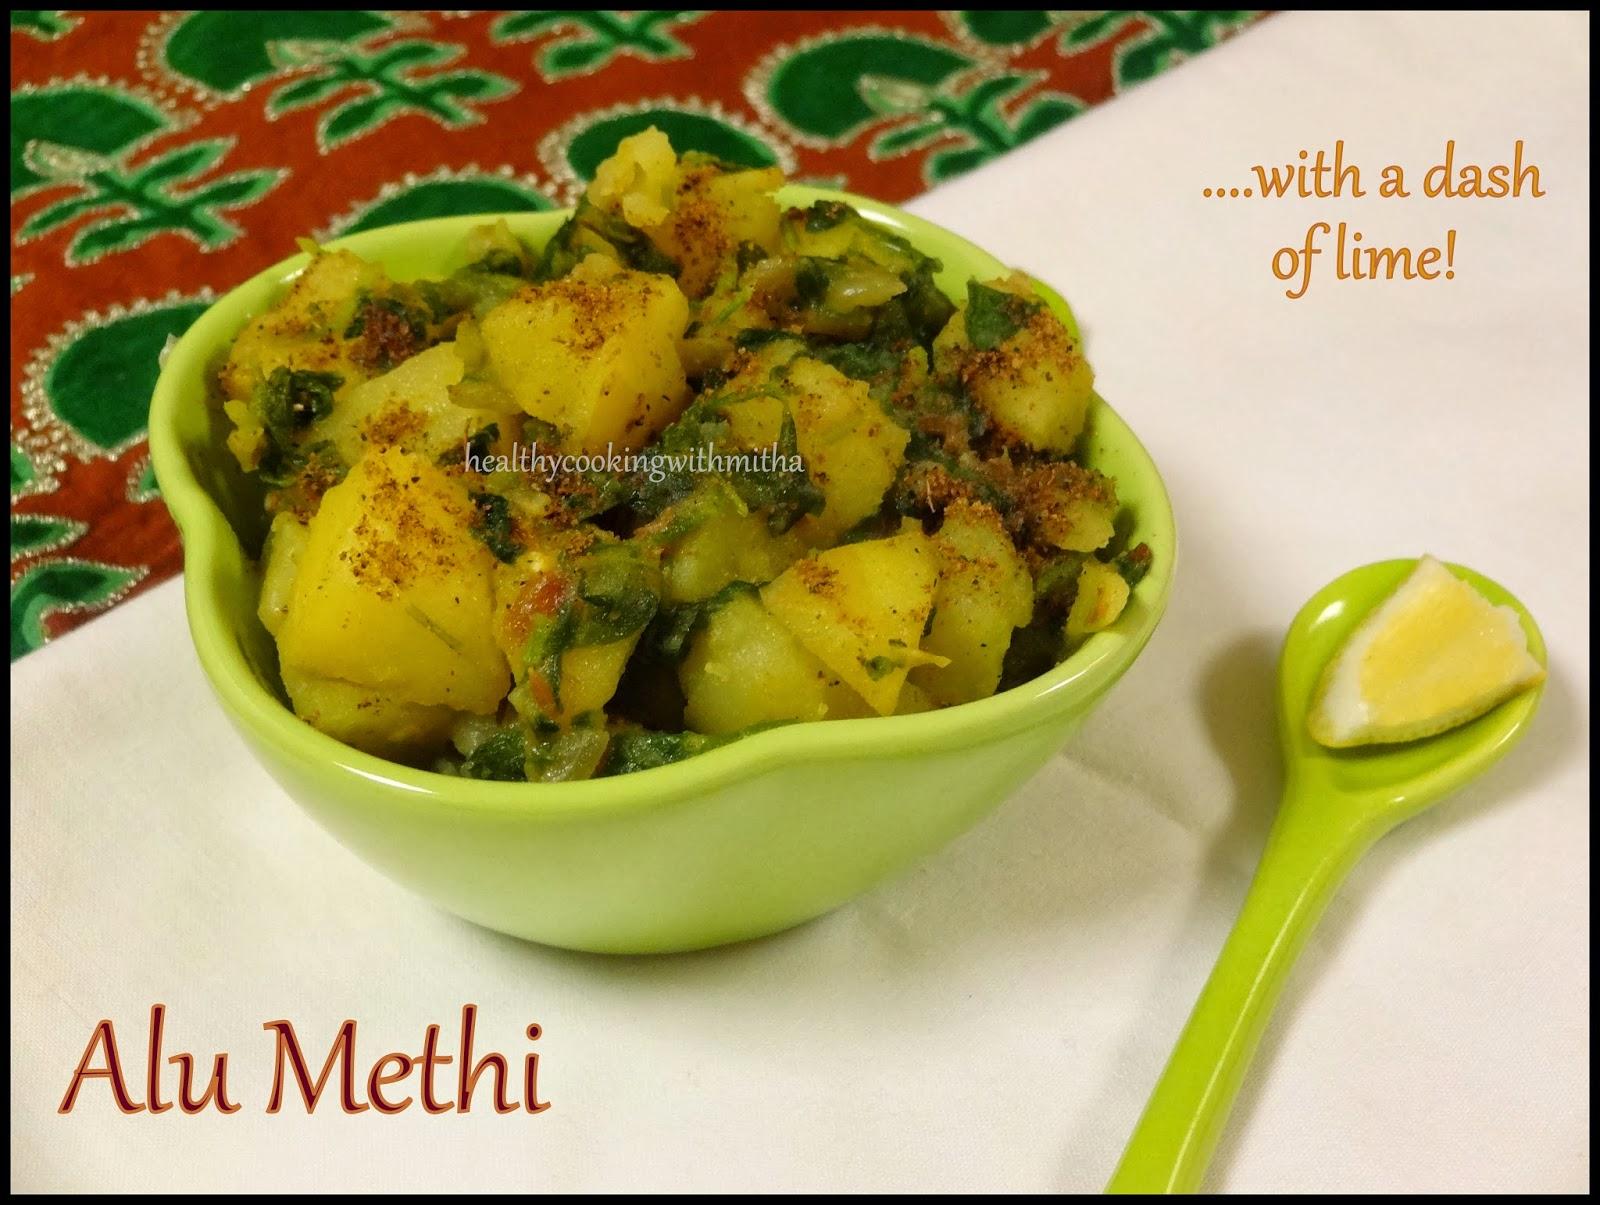 ... Mitha! A Vegetarian World..: Alu Methi/ Potato with Fenugreek Leaves